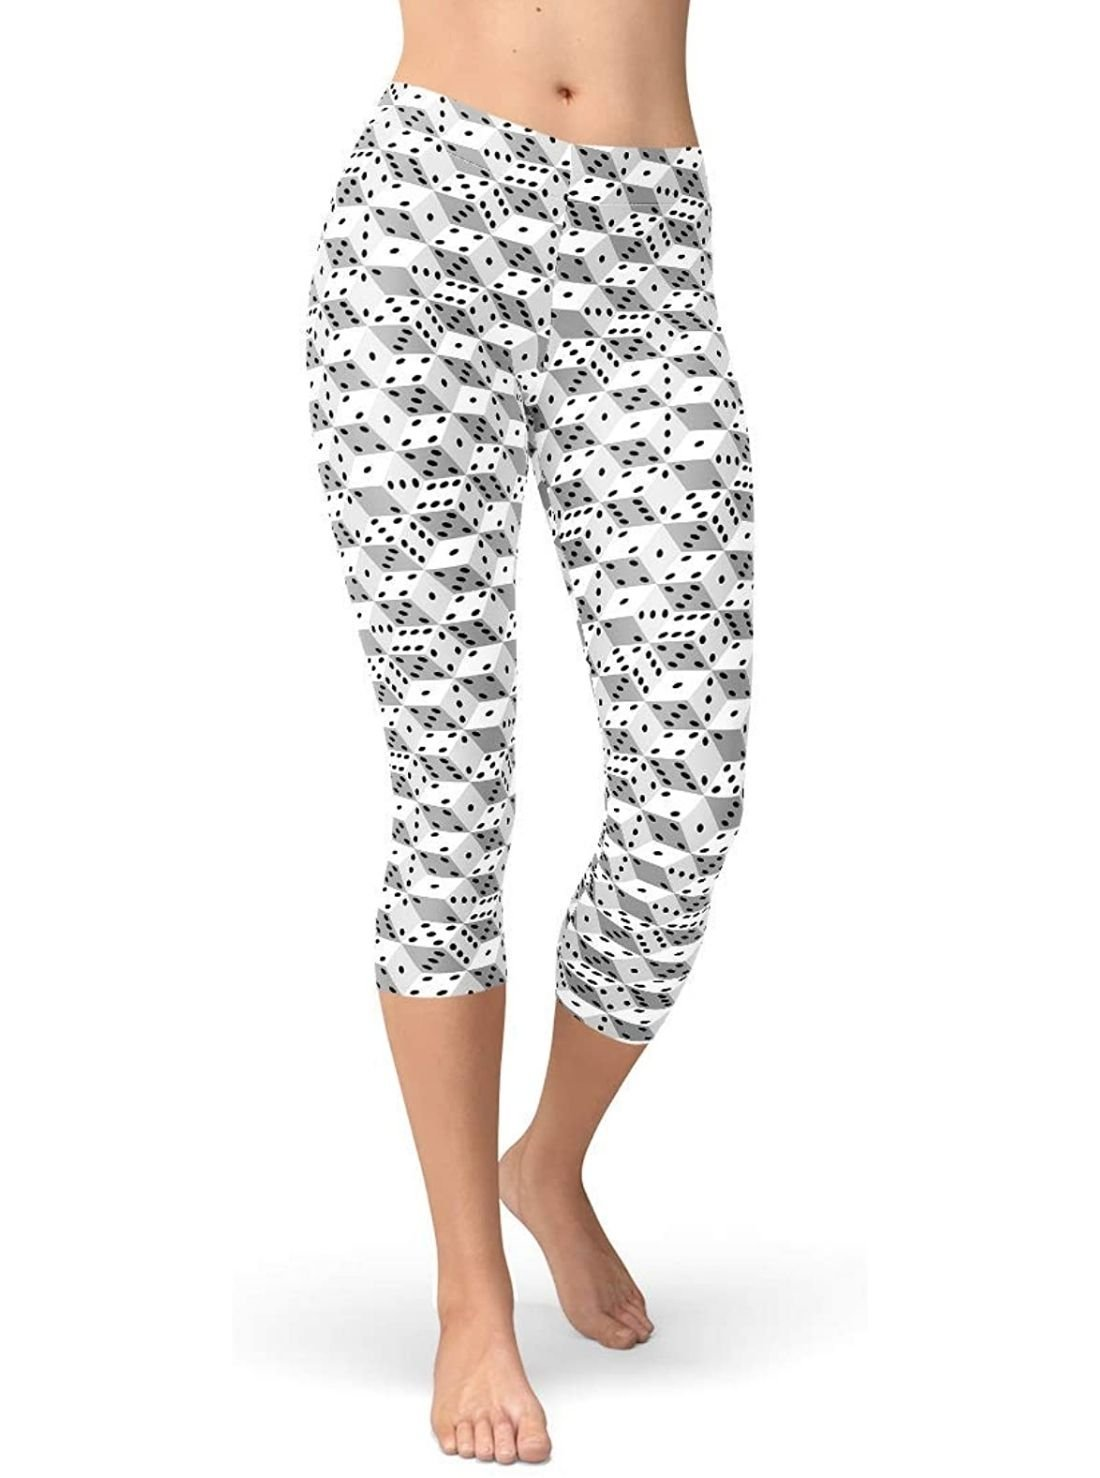 Mid-Calf Pattern Leggings